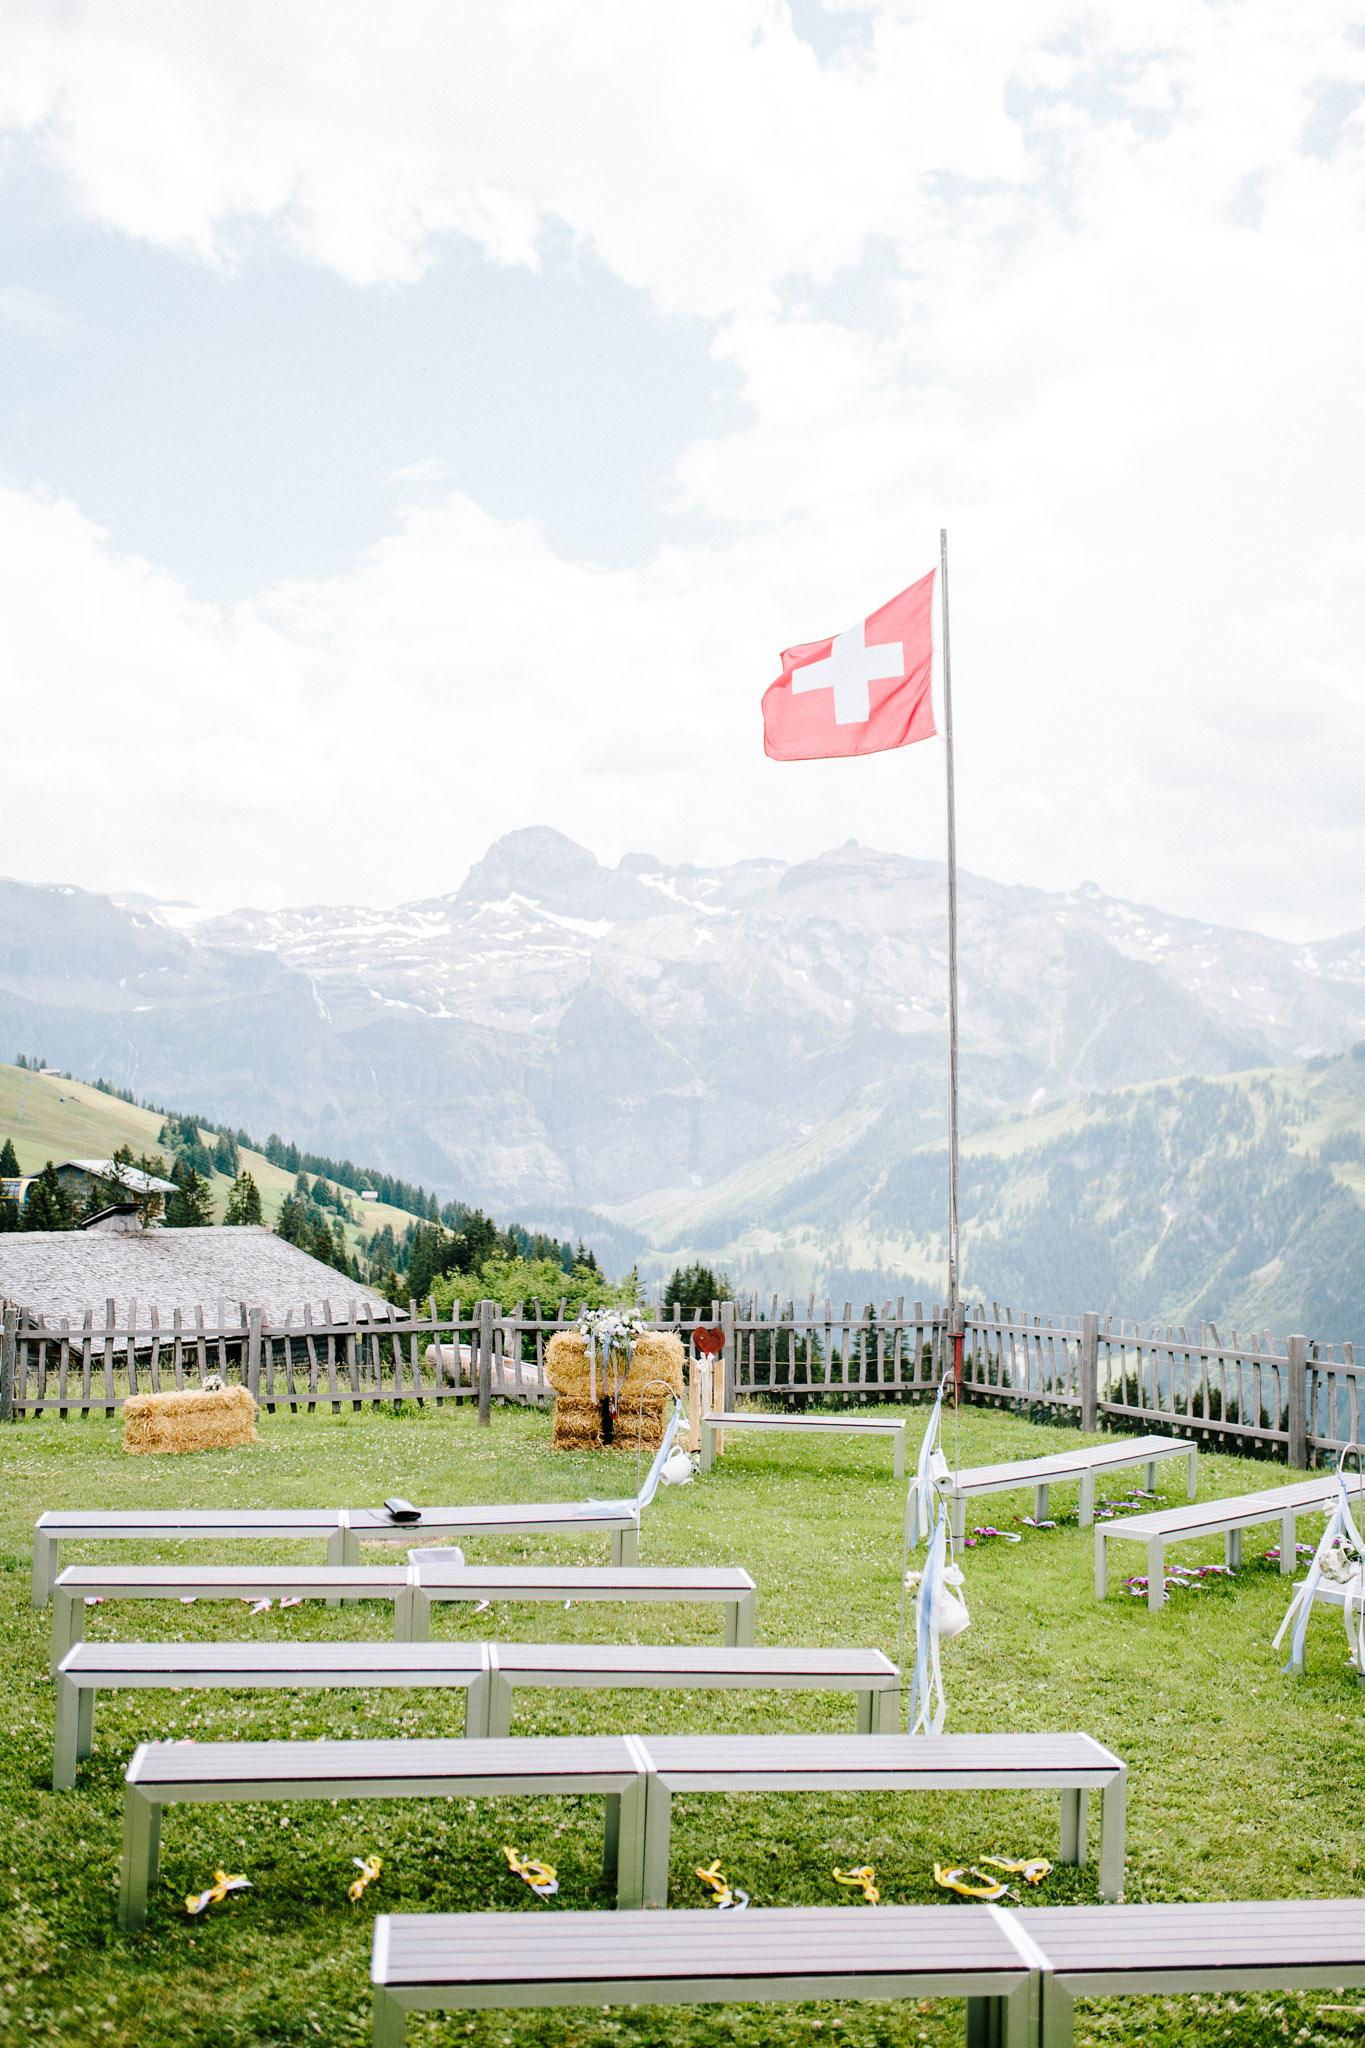 Lenl-Simmental-Buehlerhof-Pia-Anna-Christian-Wedding-Photography-EK-63.jpg